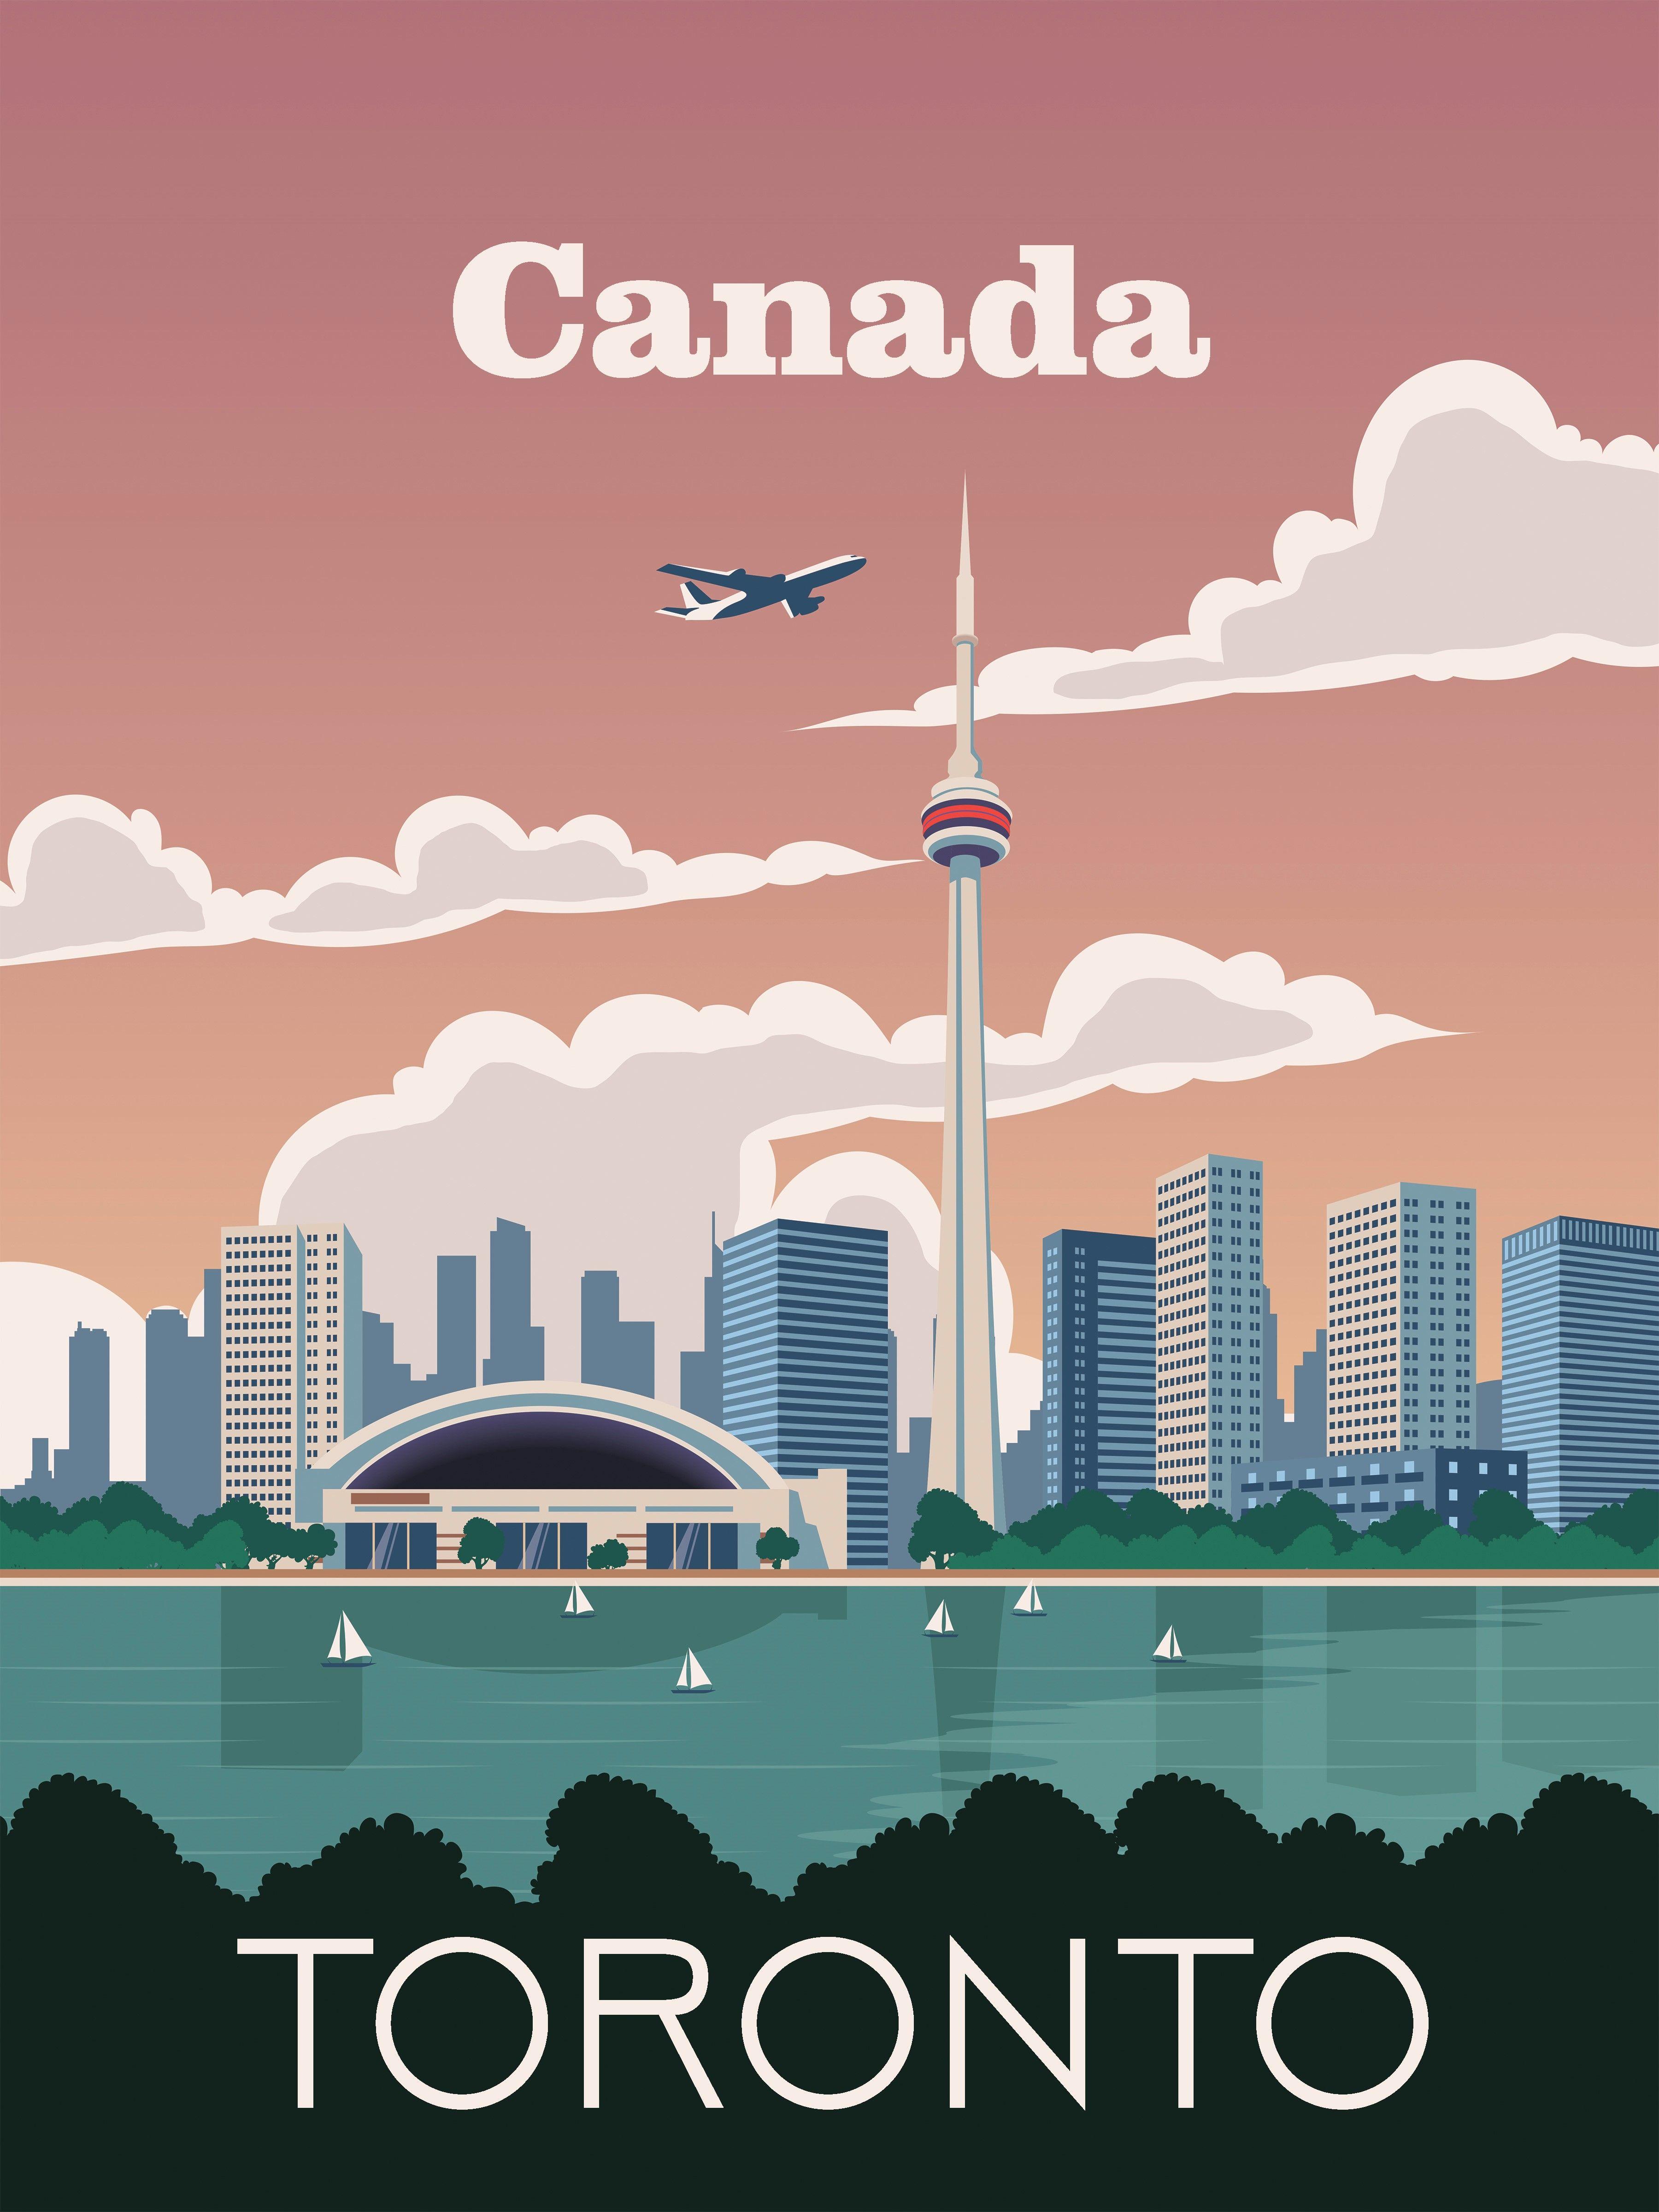 Toronto Travel Poster Vintage Retro Wall Art Skyline Map City Decor Print Retro Travel Poster Poster Vintage Retro Vintage Travel Posters